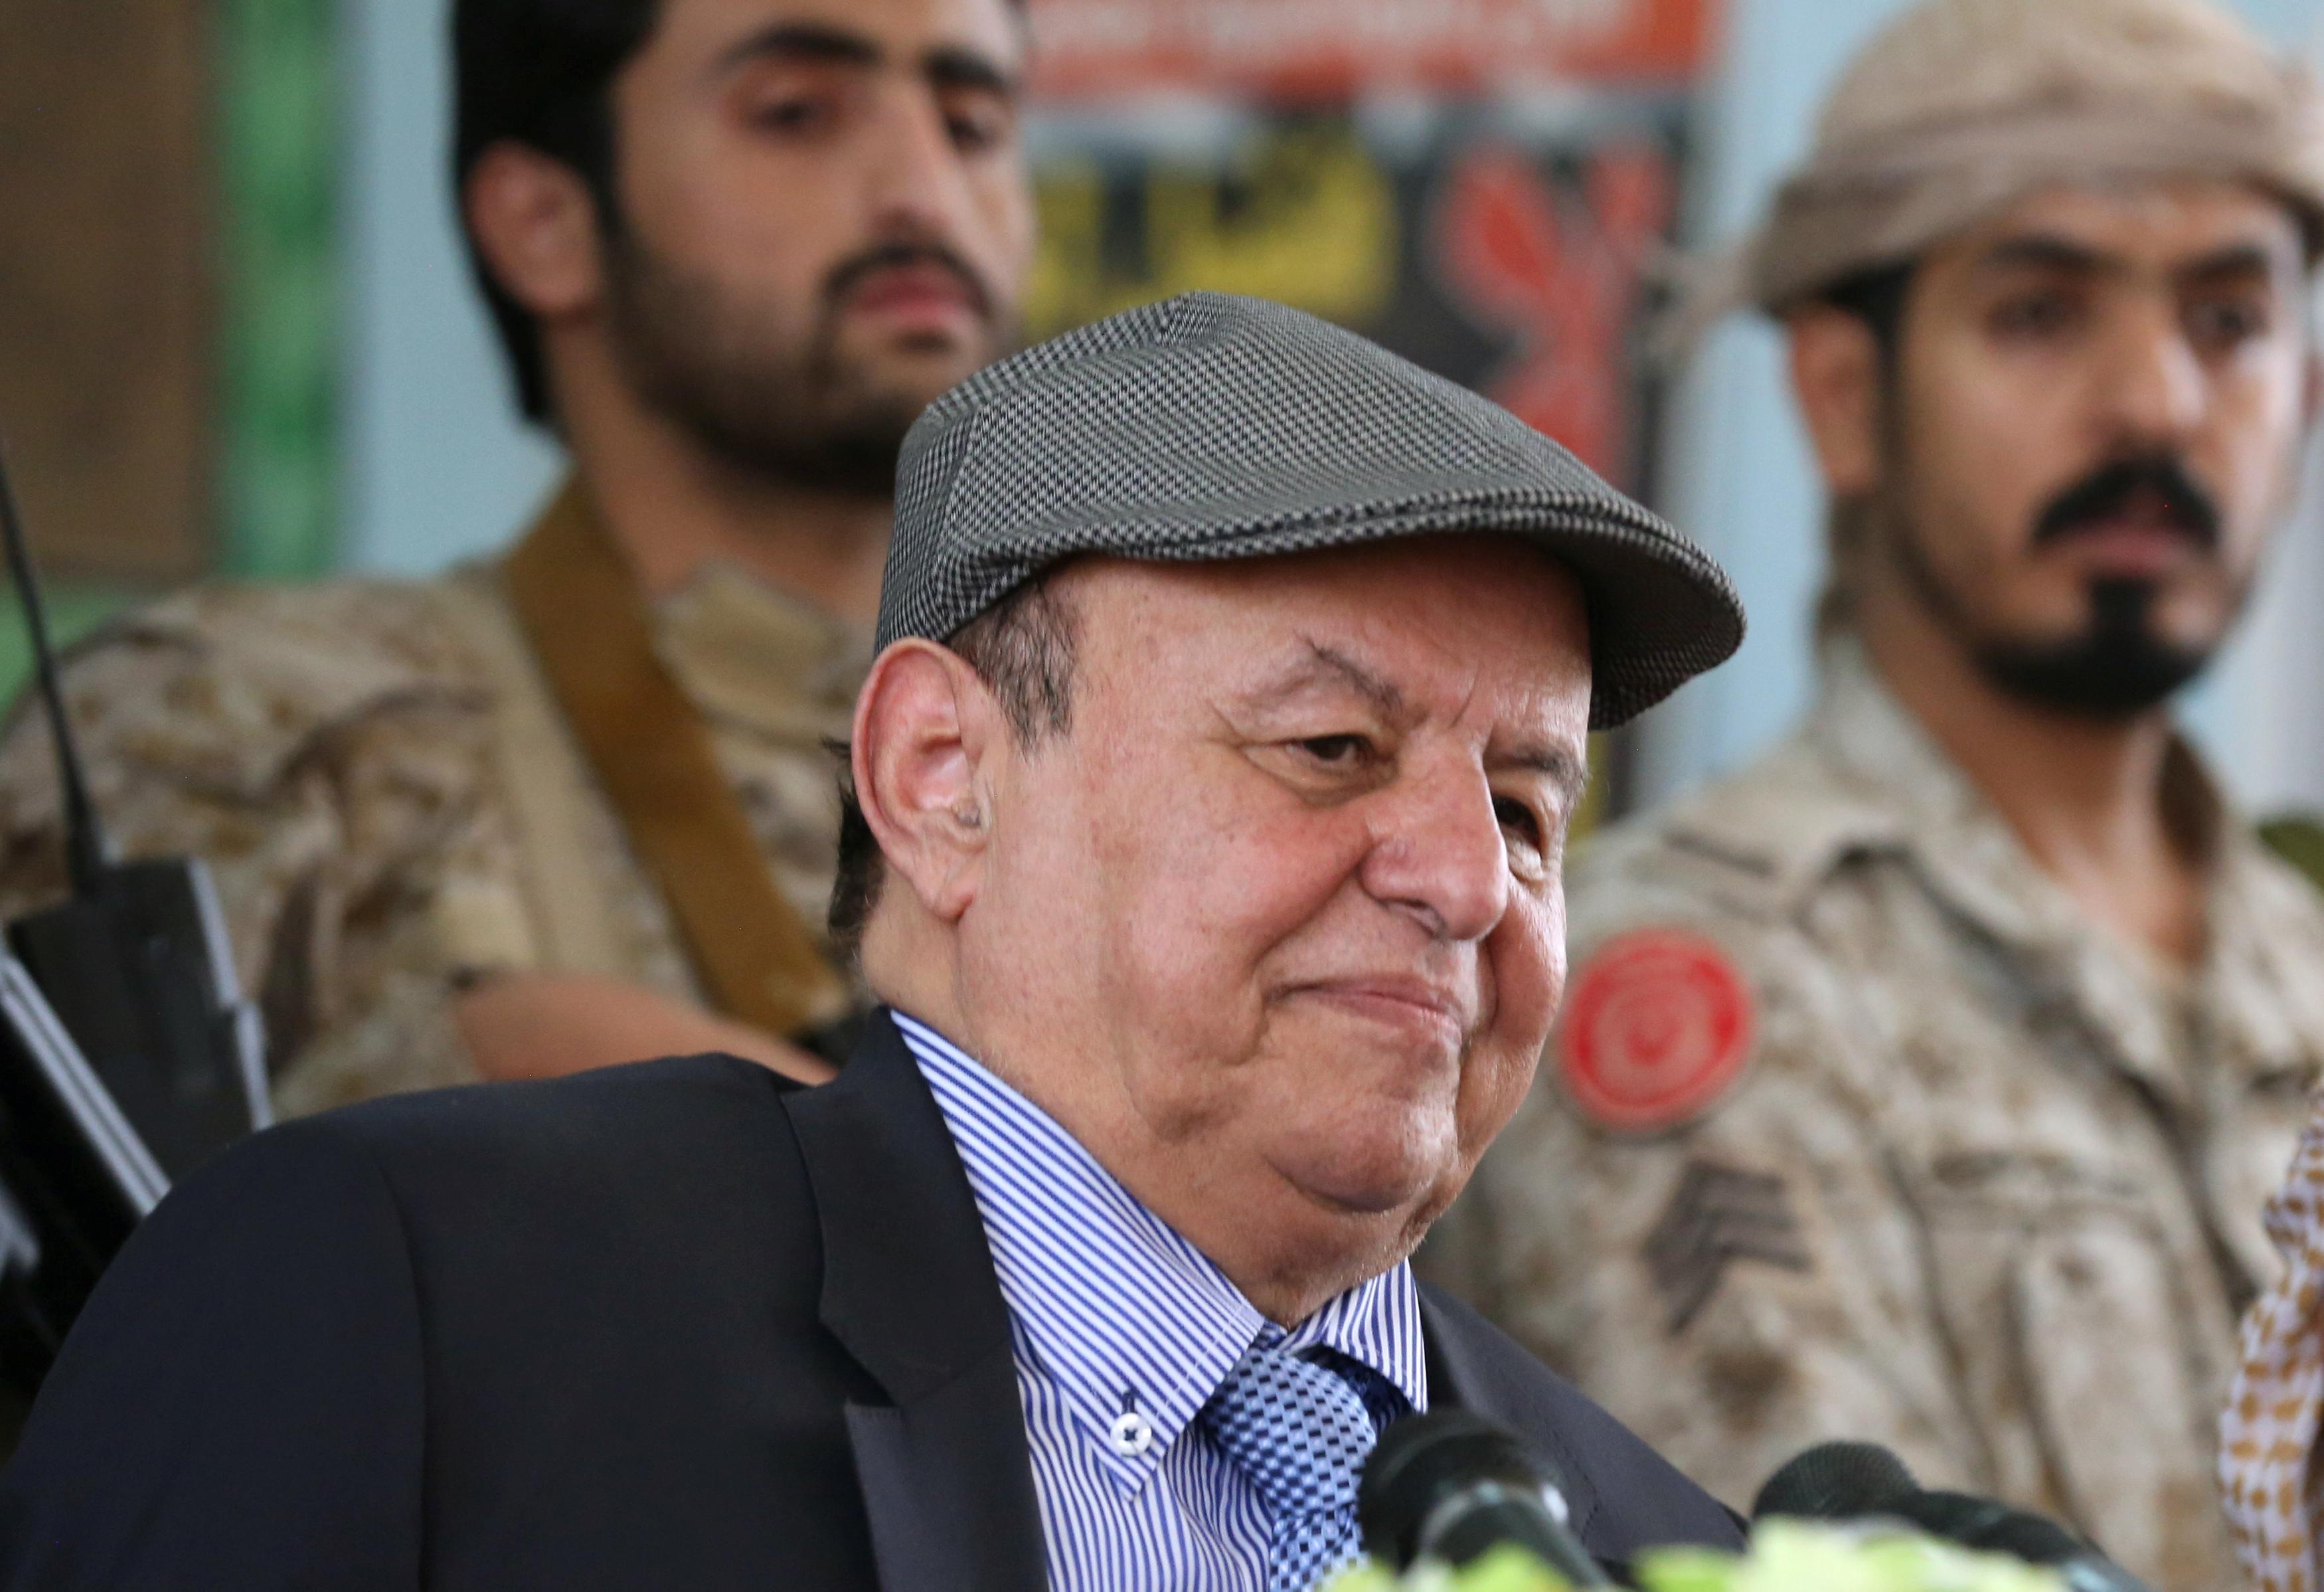 Yemen leader-in-exile Hadi returns for meeting of divided parliament